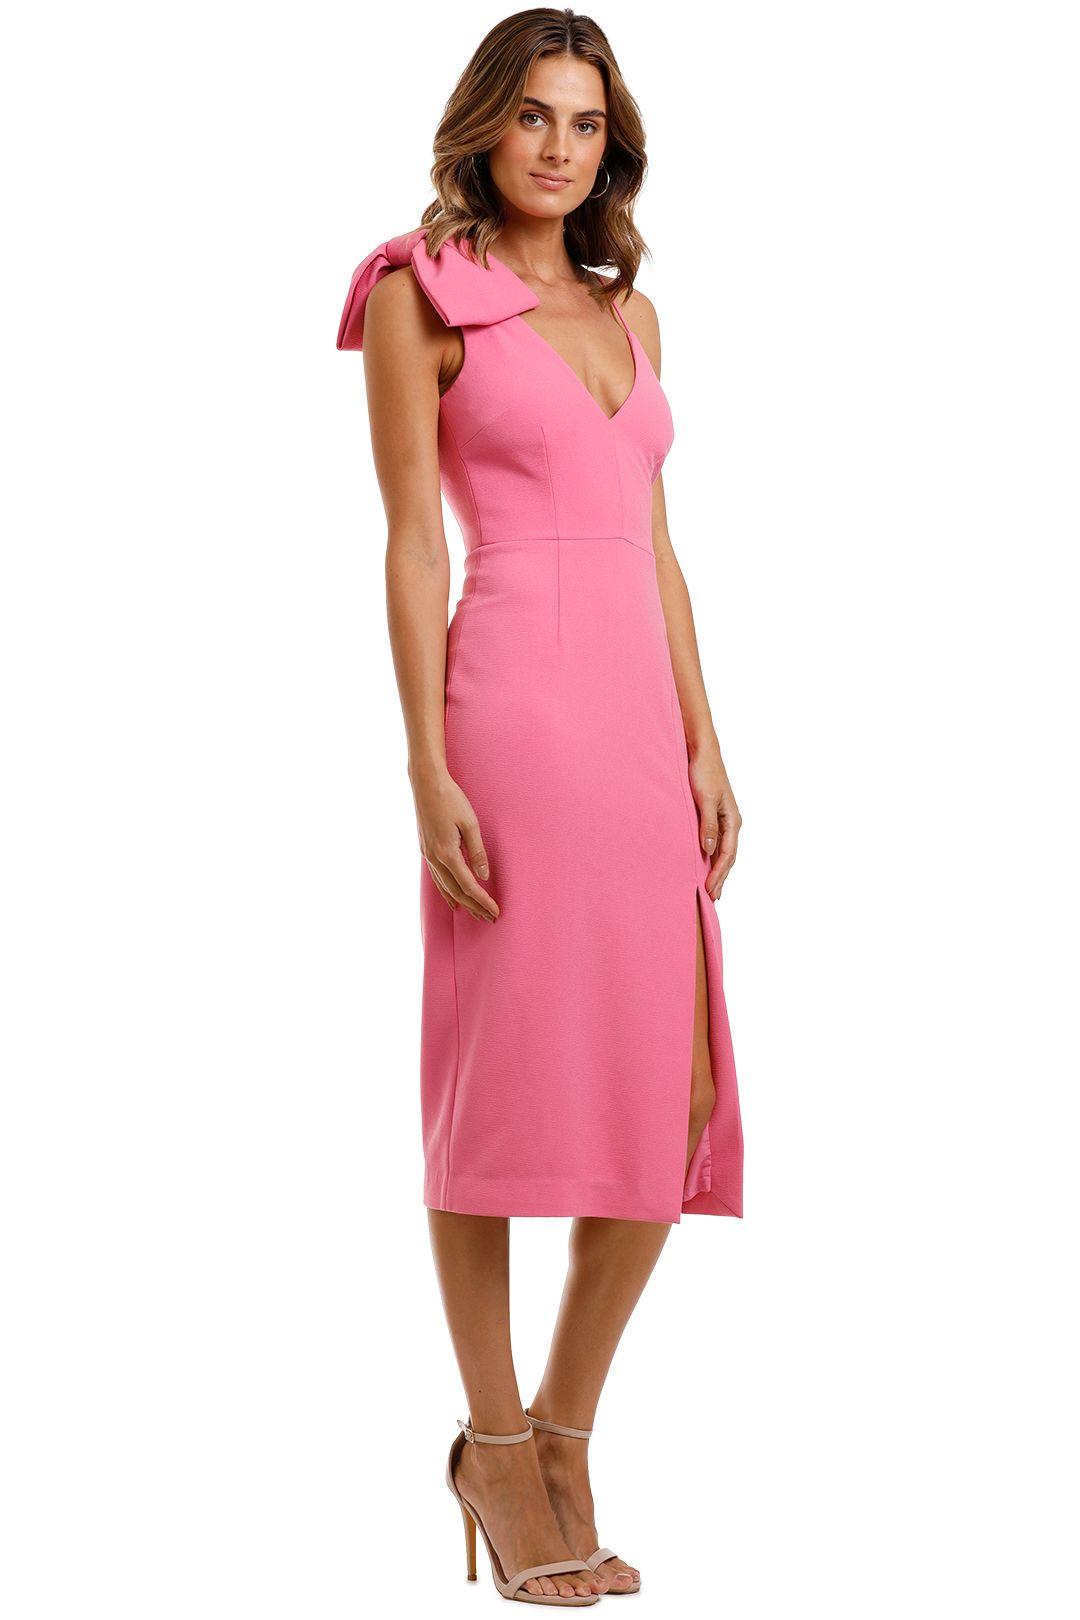 Rebecca Vallance Love Bow Dress Pink Midi Length